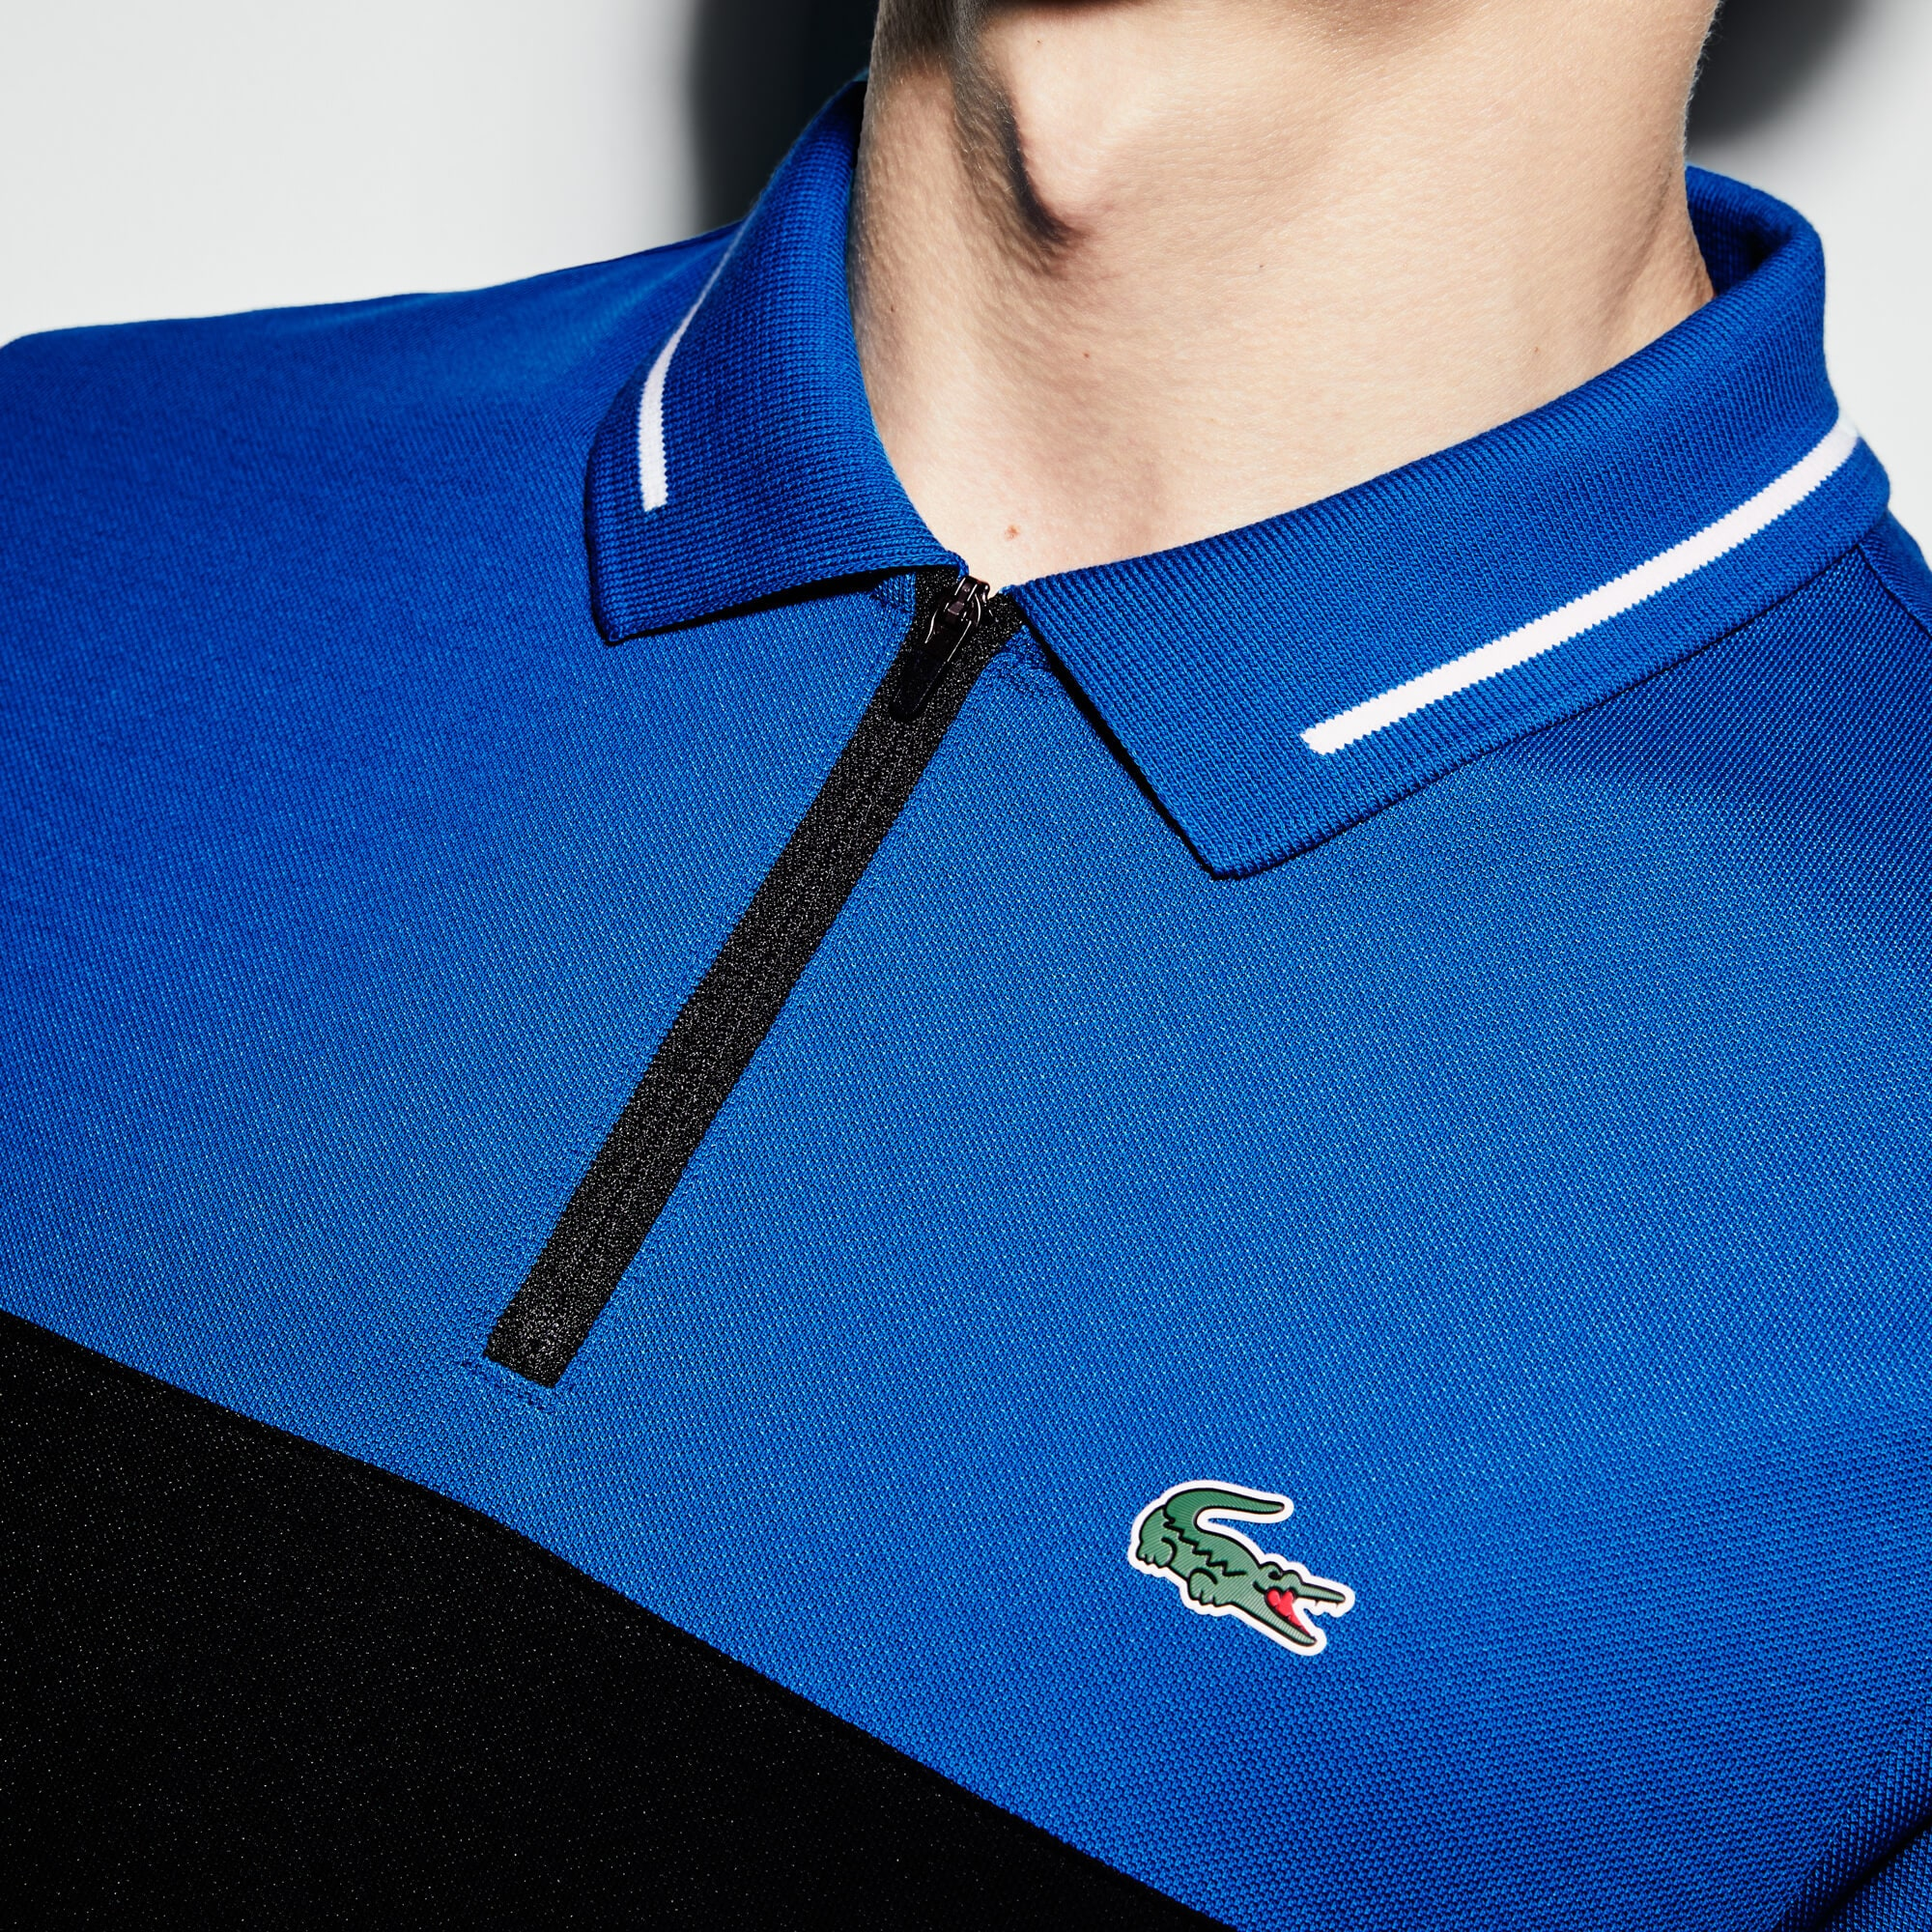 Lacoste - Herren LACOSTE SPORT Tennis-Poloshirt aus Funktionspiqué - 5